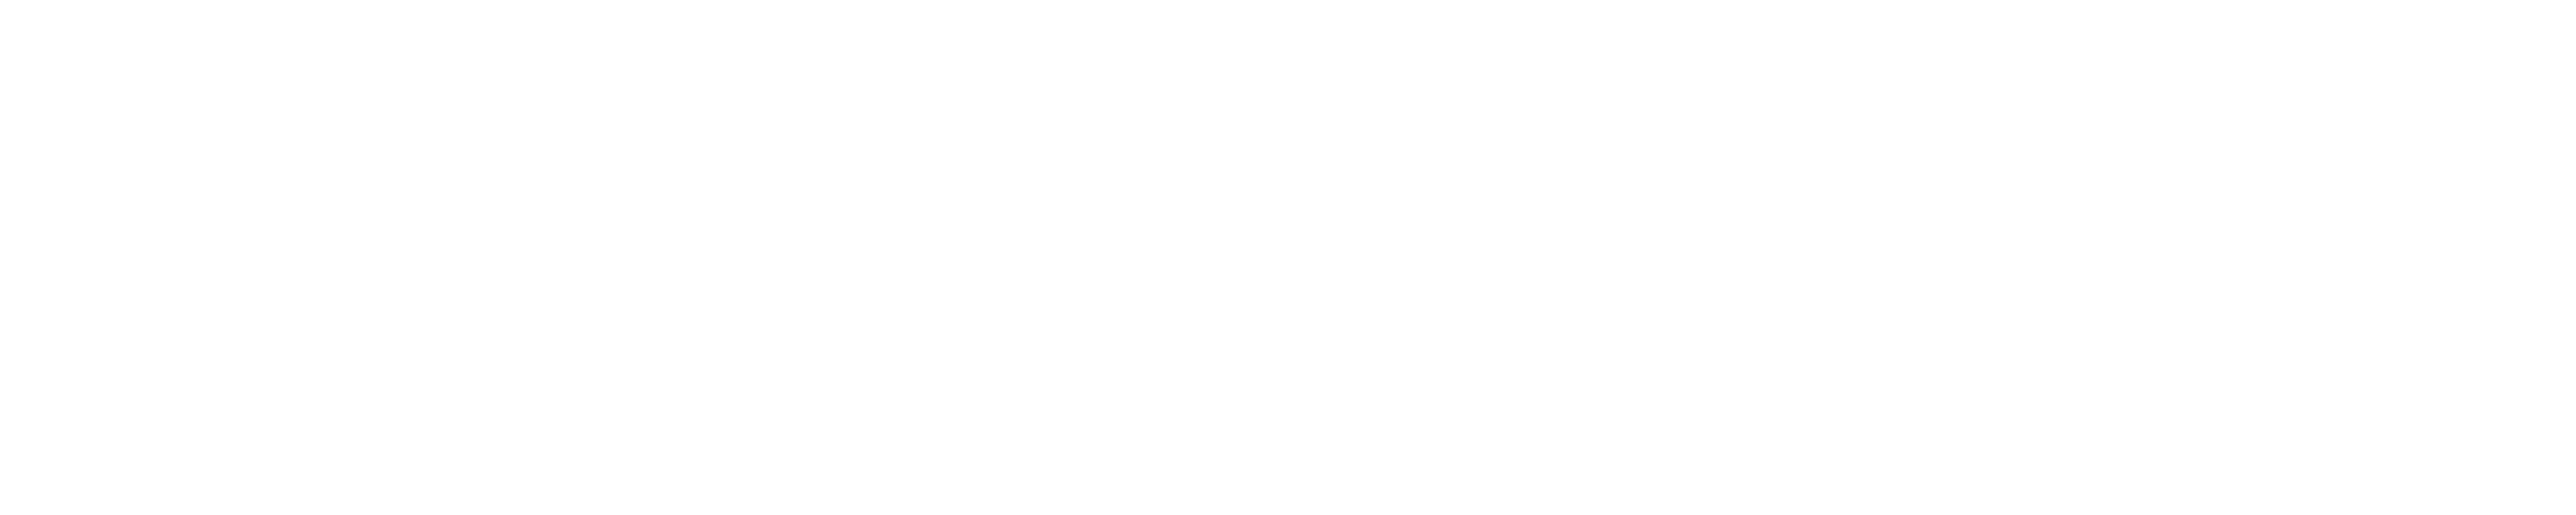 OEM AUTOMATIC